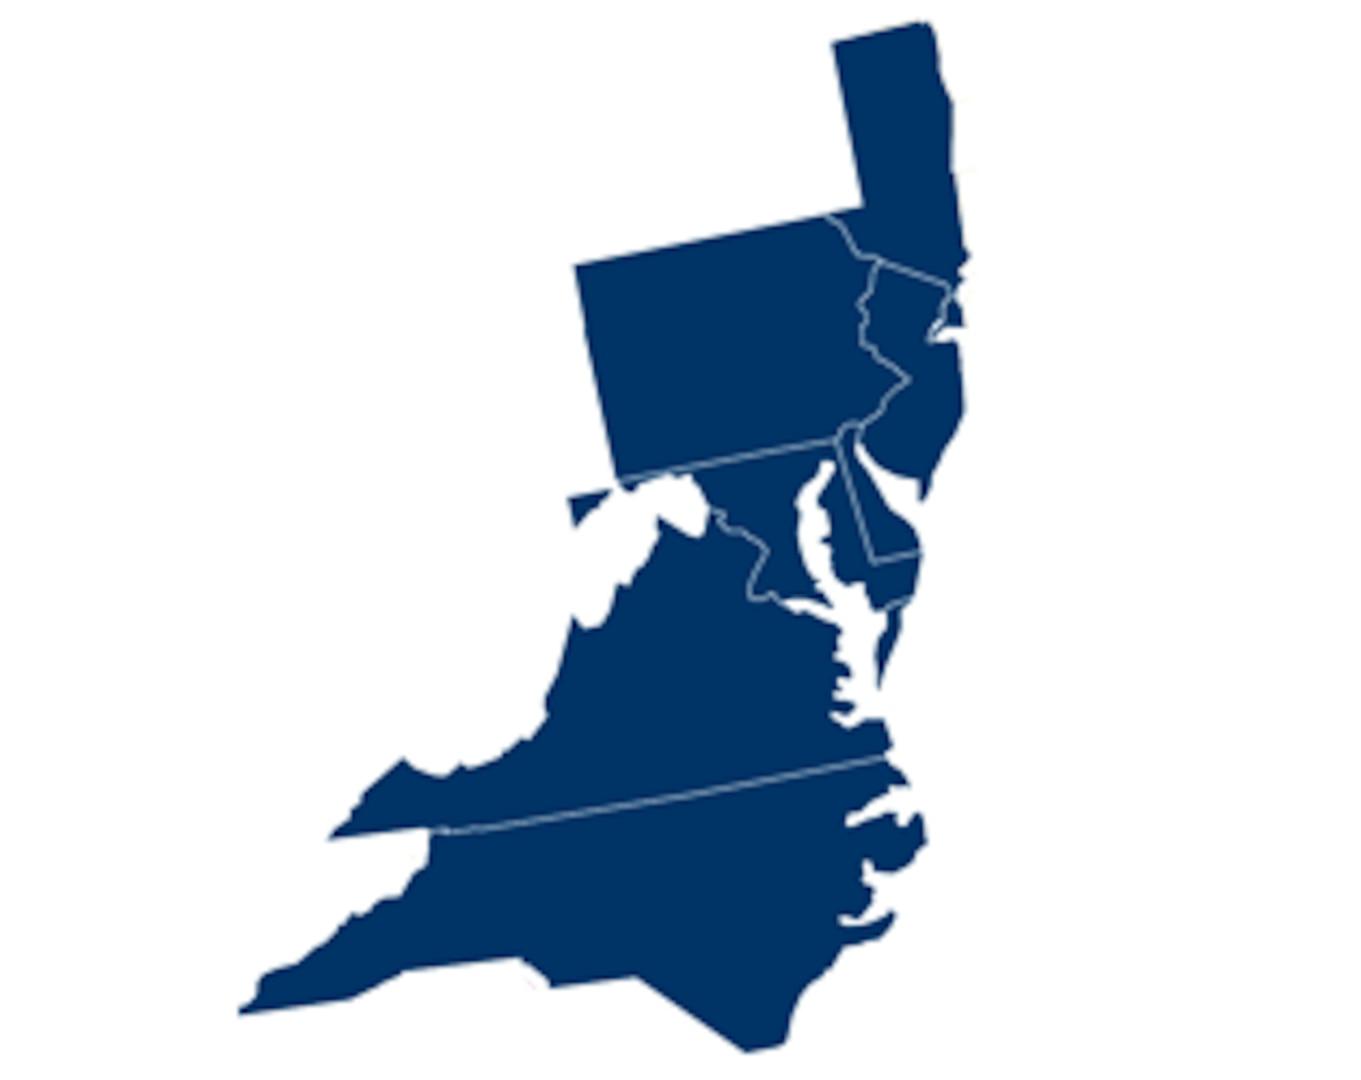 District 5: Delaware, Maryland, New Jersey, North Carolina, Pennsylvania, Virginia, Washington D.C